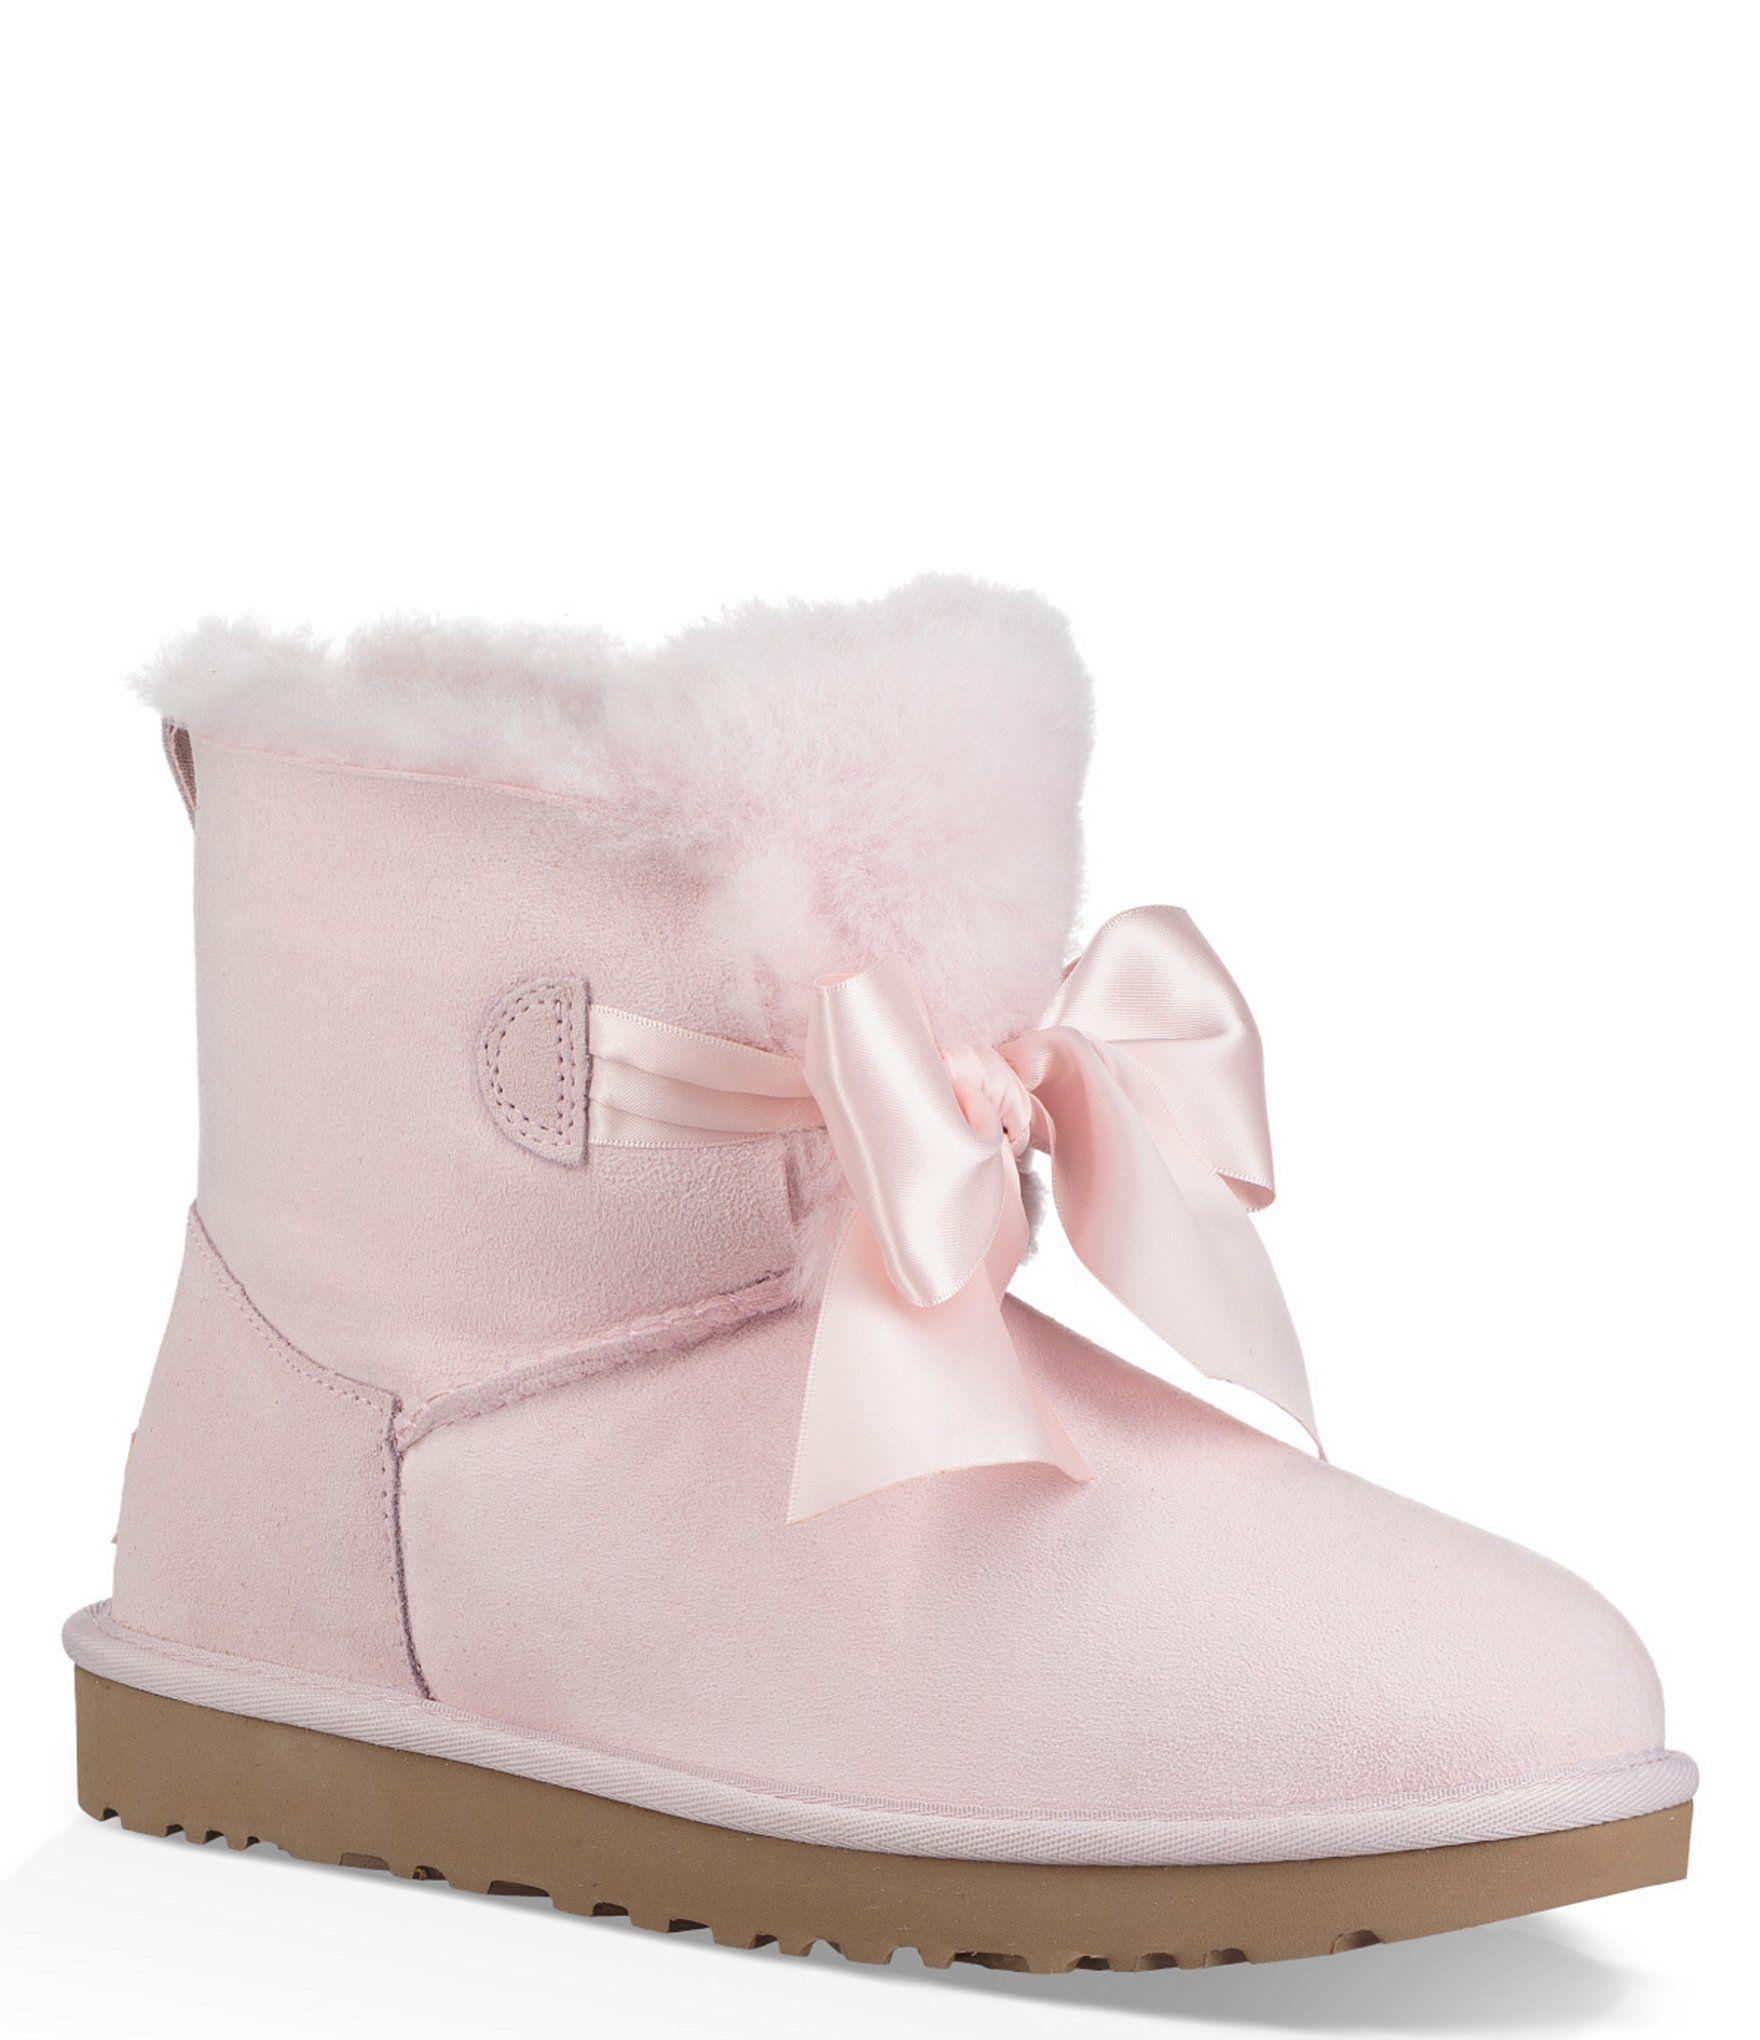 a1e0ed89e02e3 UGG® Gita Bow Mini Booties  Dillards